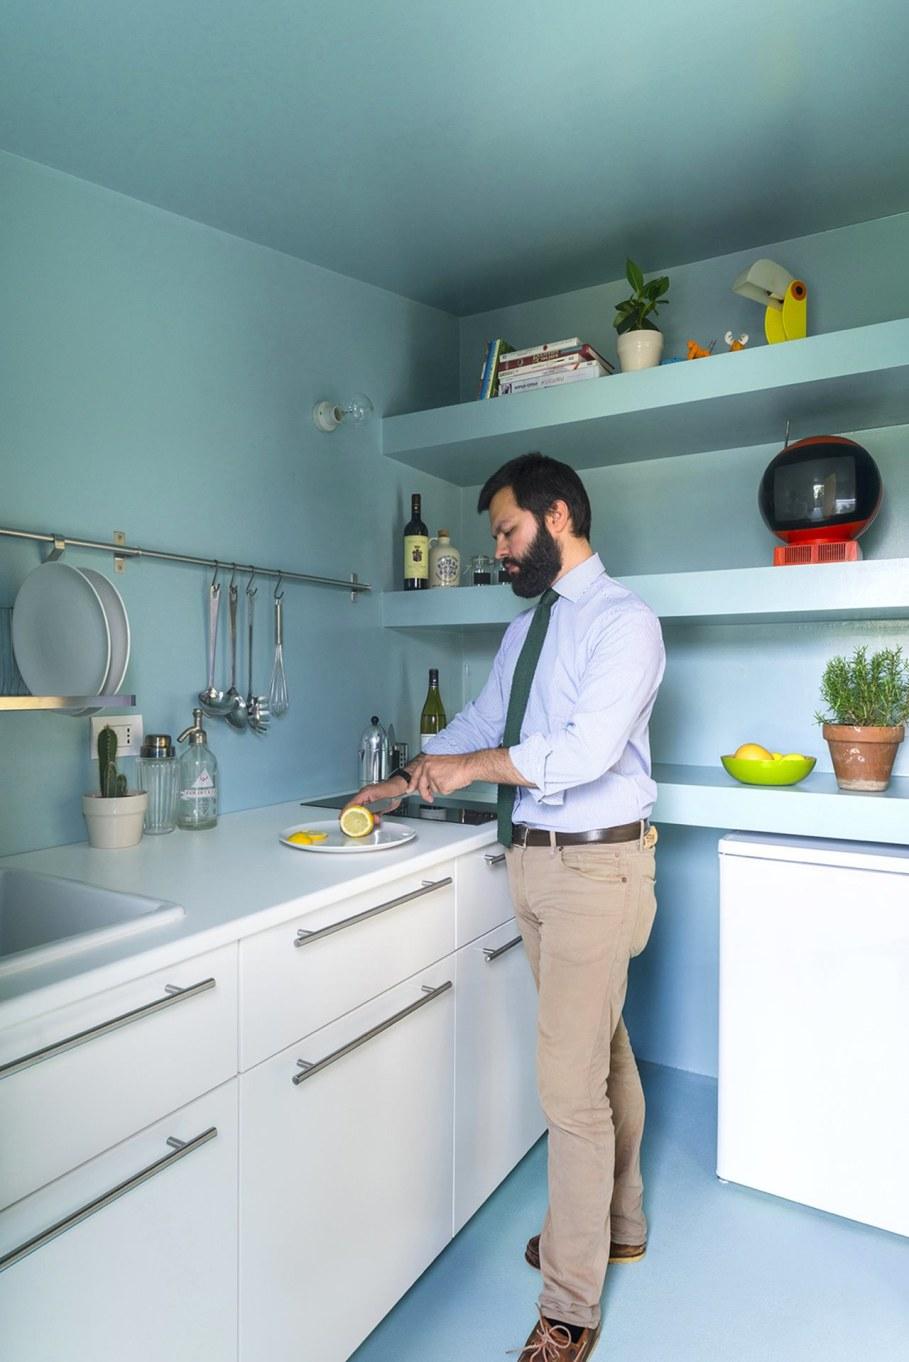 OCS Batipin Flat Transformer Apartment In Milan - Kitchen